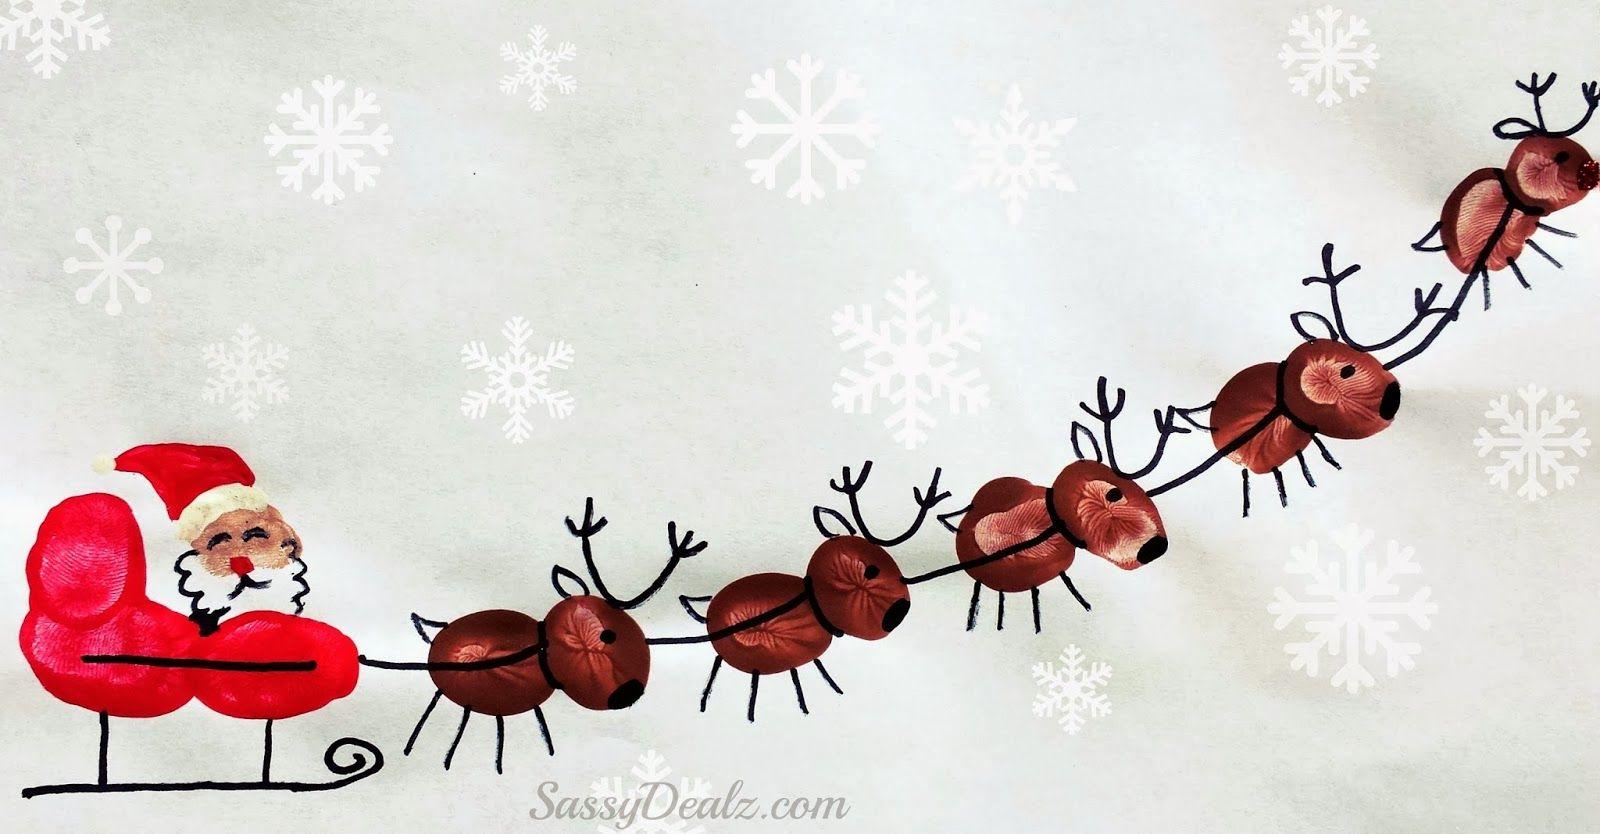 fingerprint santa sleigh reindeer | Christmas ( reindeer, snowman ...